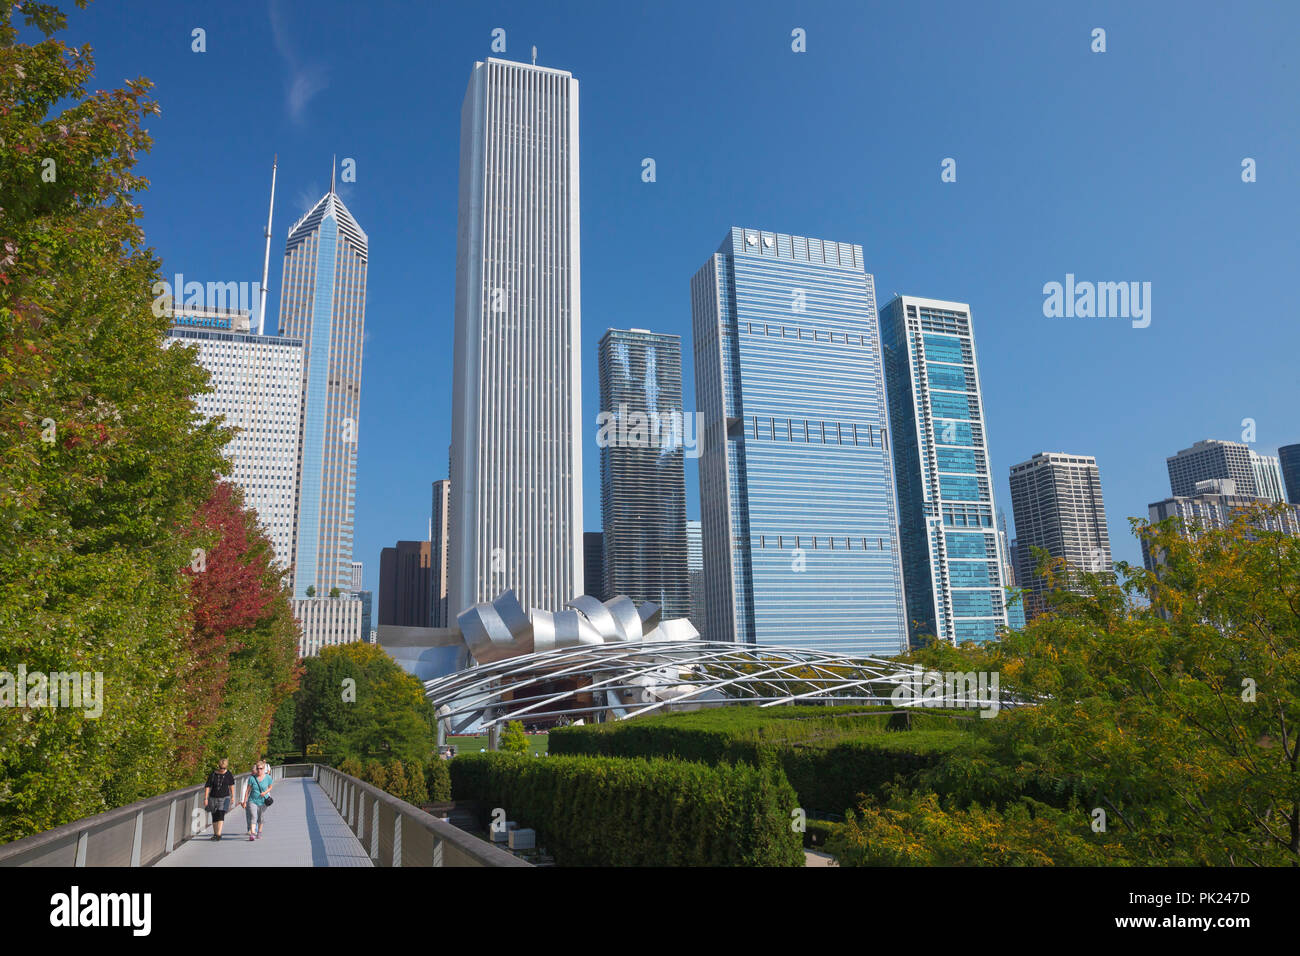 Visitors on the Nichols Bridgeway, Millennium Park, Chicago city center, Illinois, USA - Stock Image